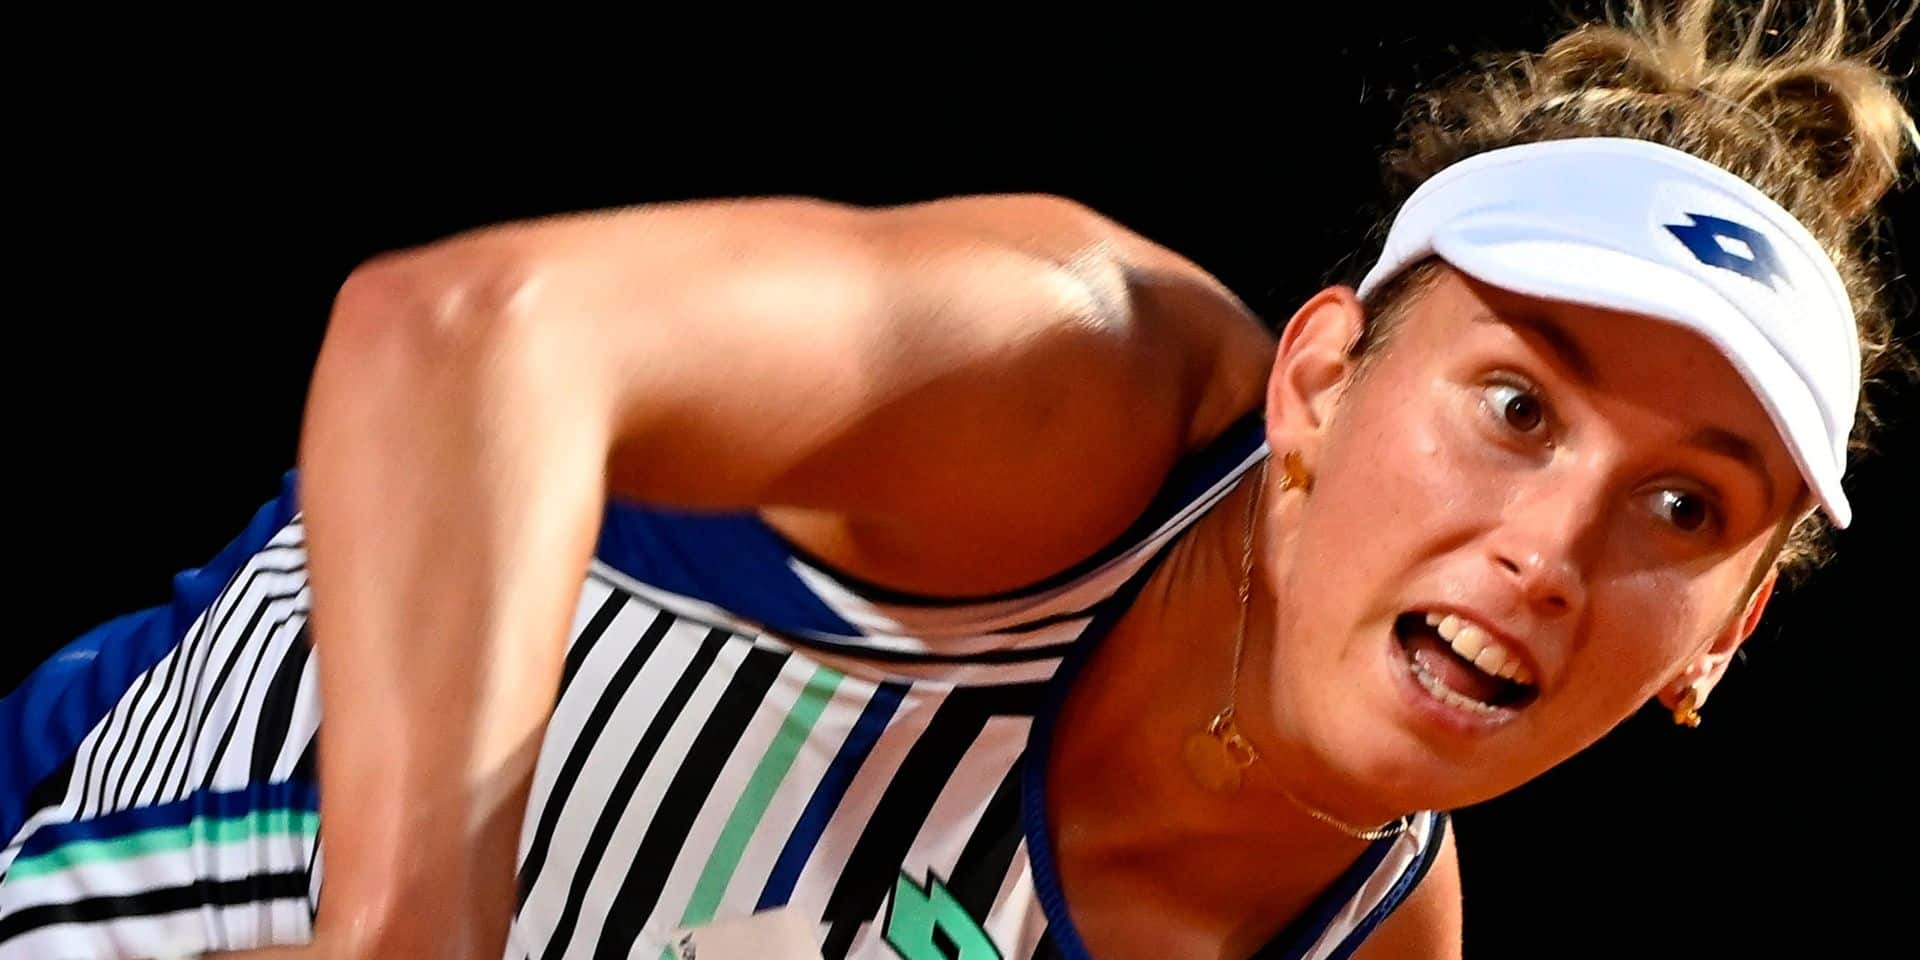 Roland-Garros: Mertens hérite de Gasparyan au 1er tour, Flipkens contre Putintseva